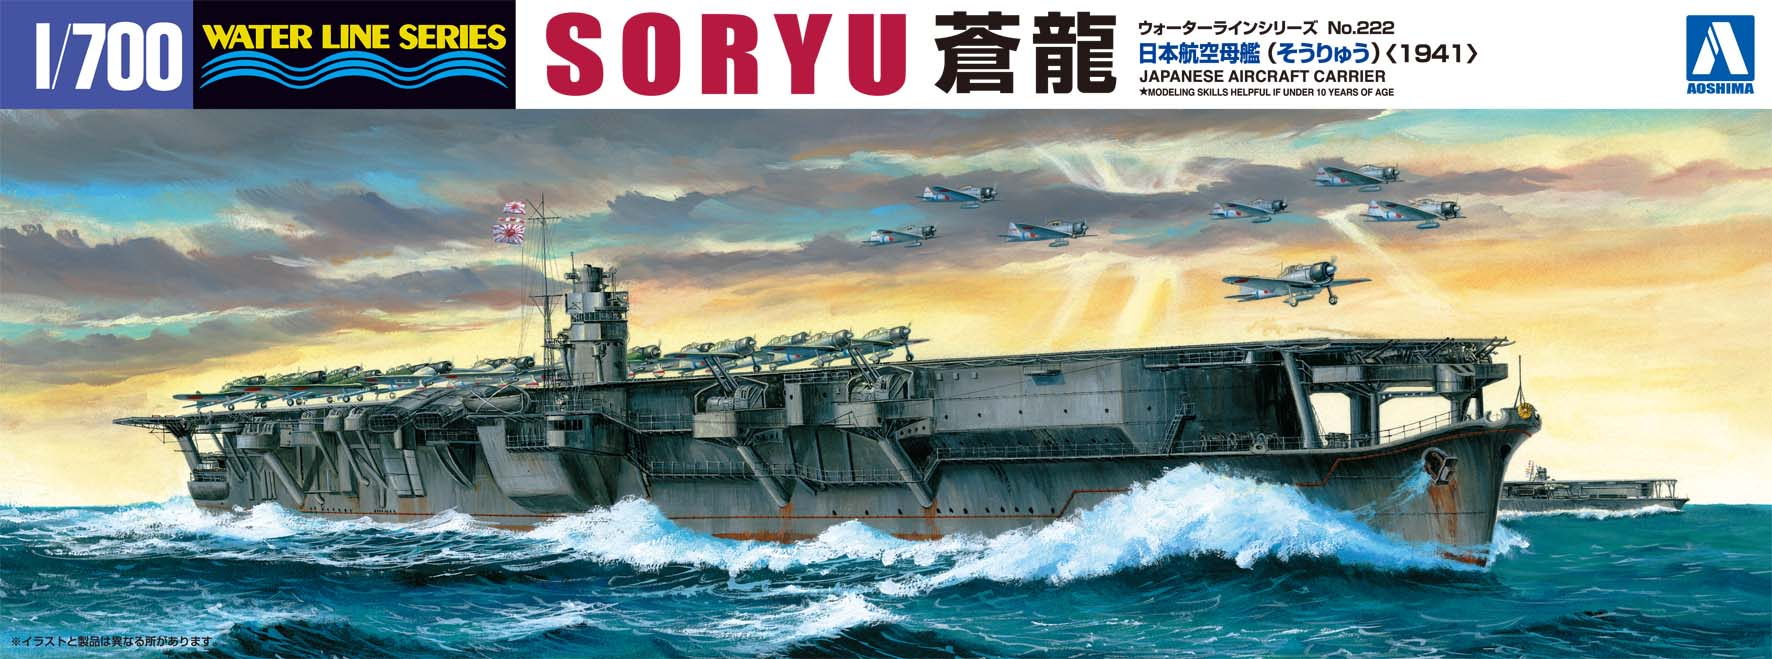 Aoshima 1/700 I.J.N. AIRCRAFT CARRIER SORYU (1941)